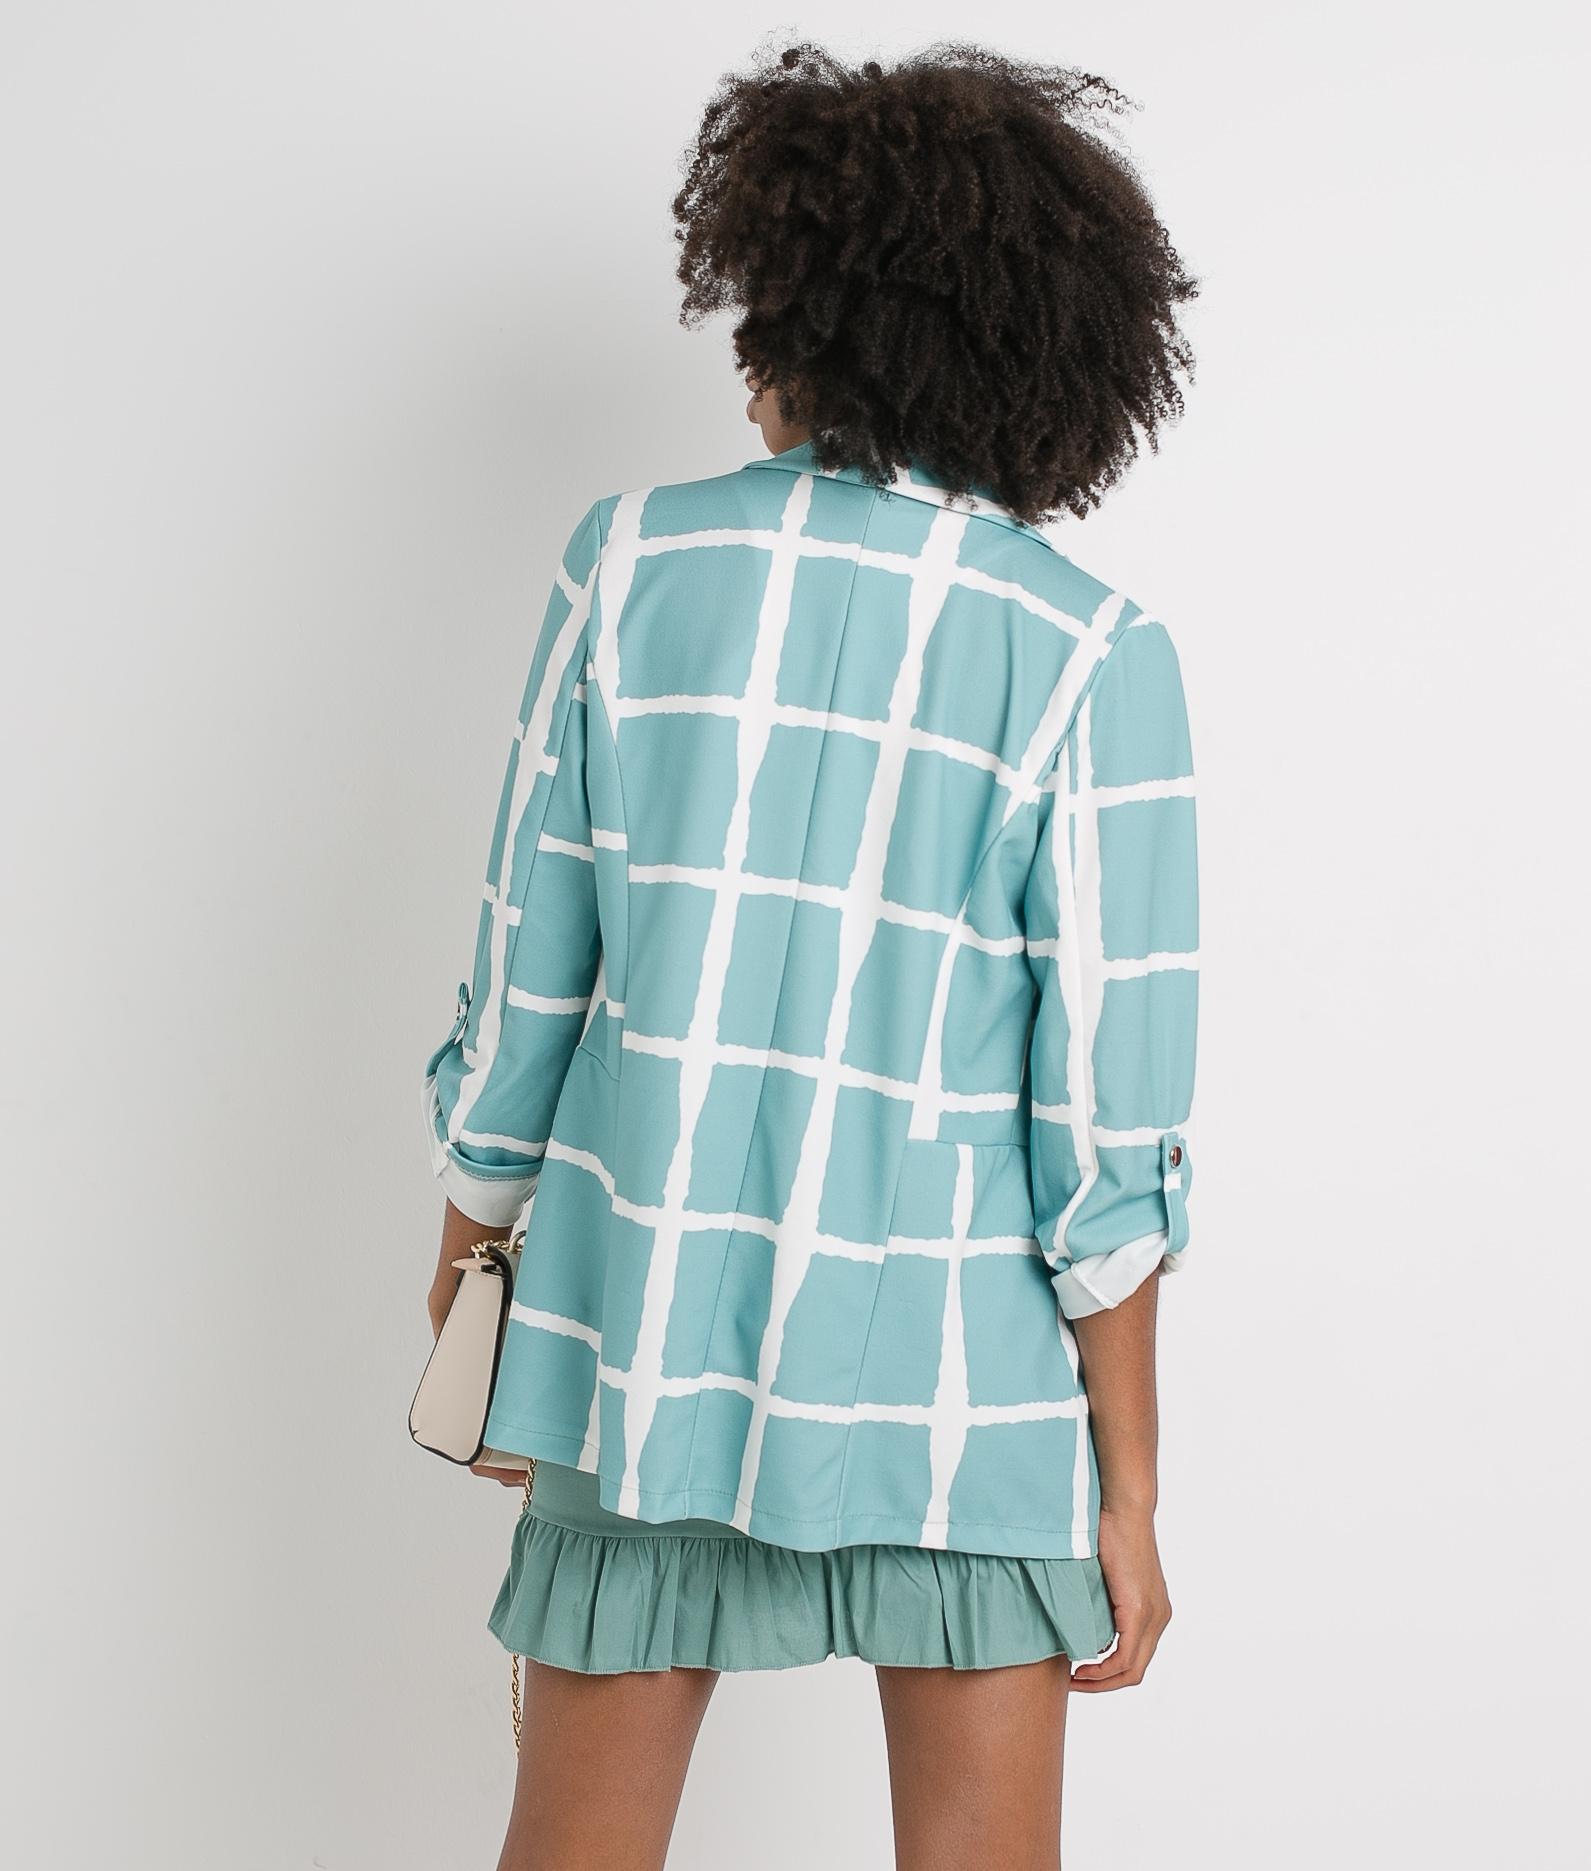 BLAZER ONA - Turquoise